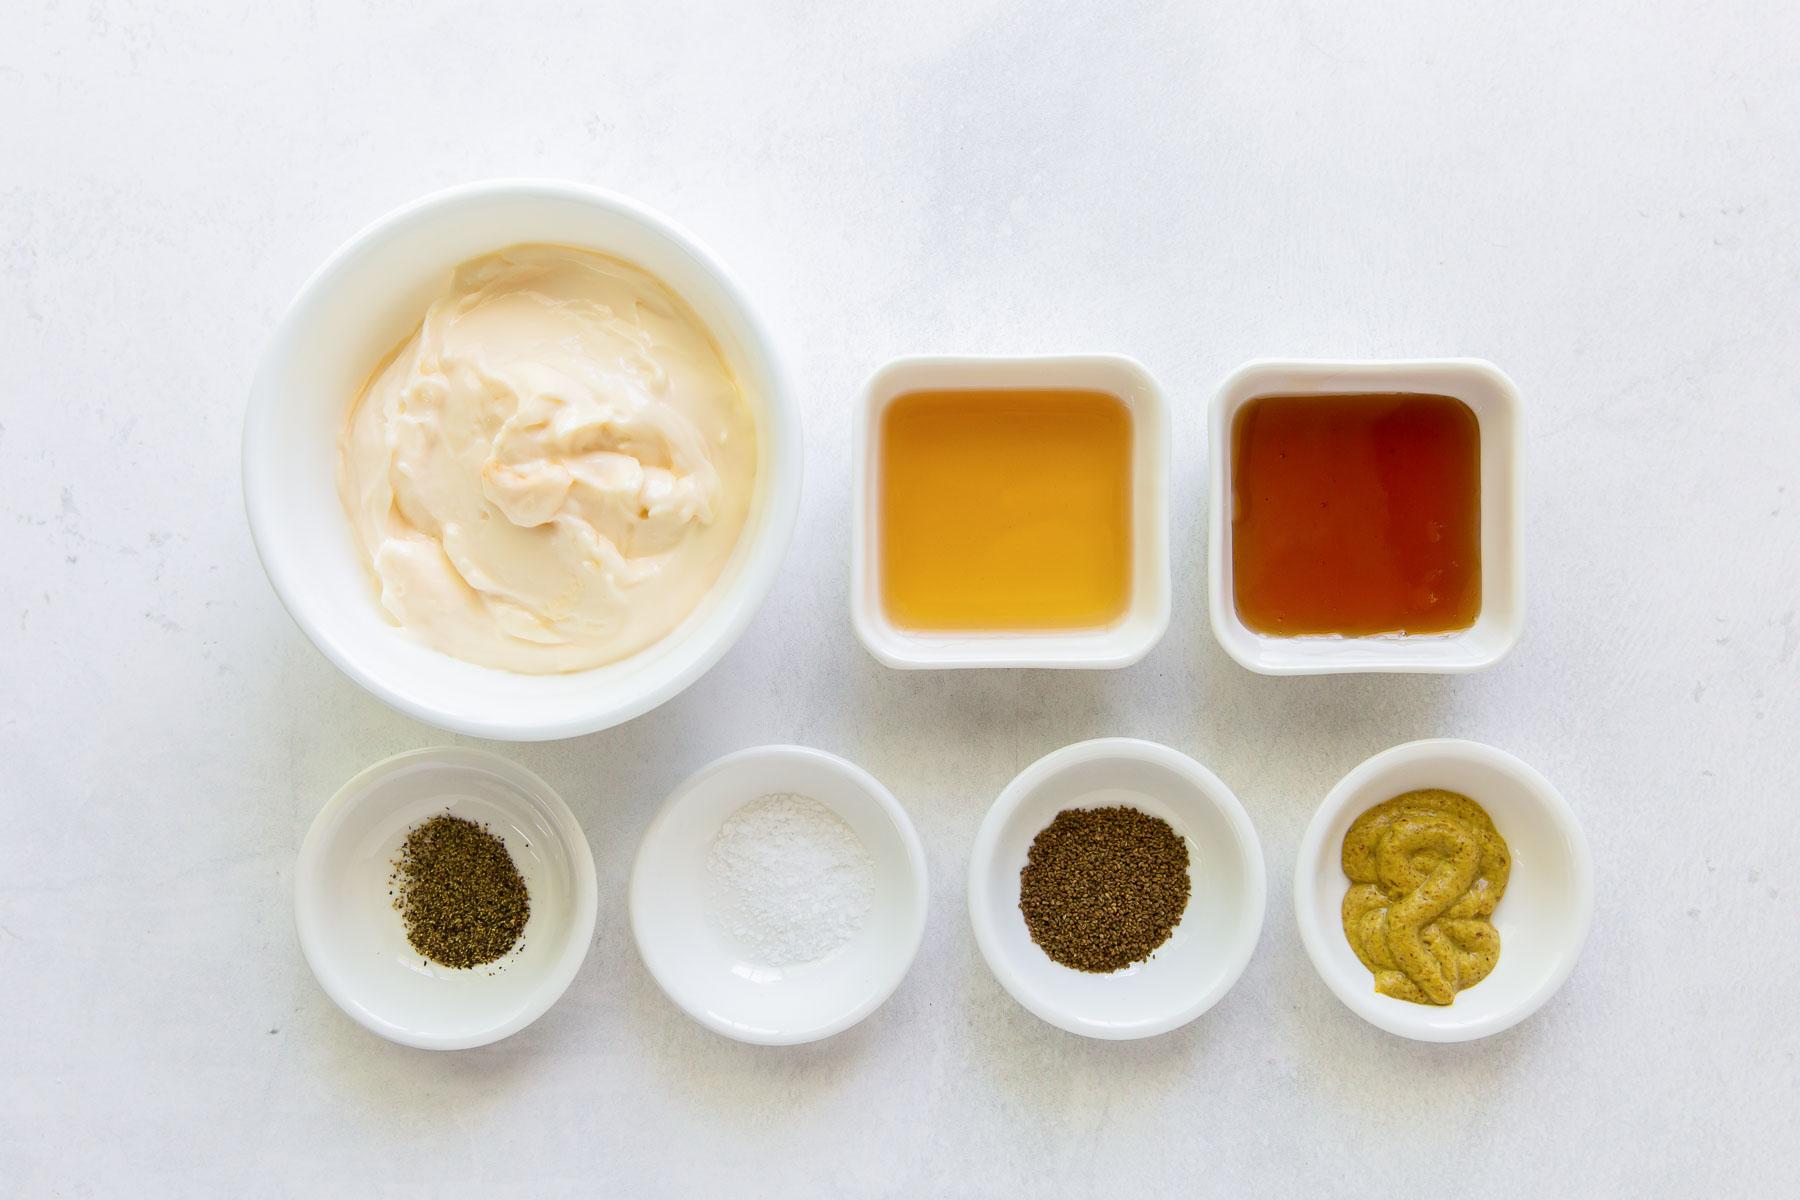 ingredients for coleslaw dressing recipe